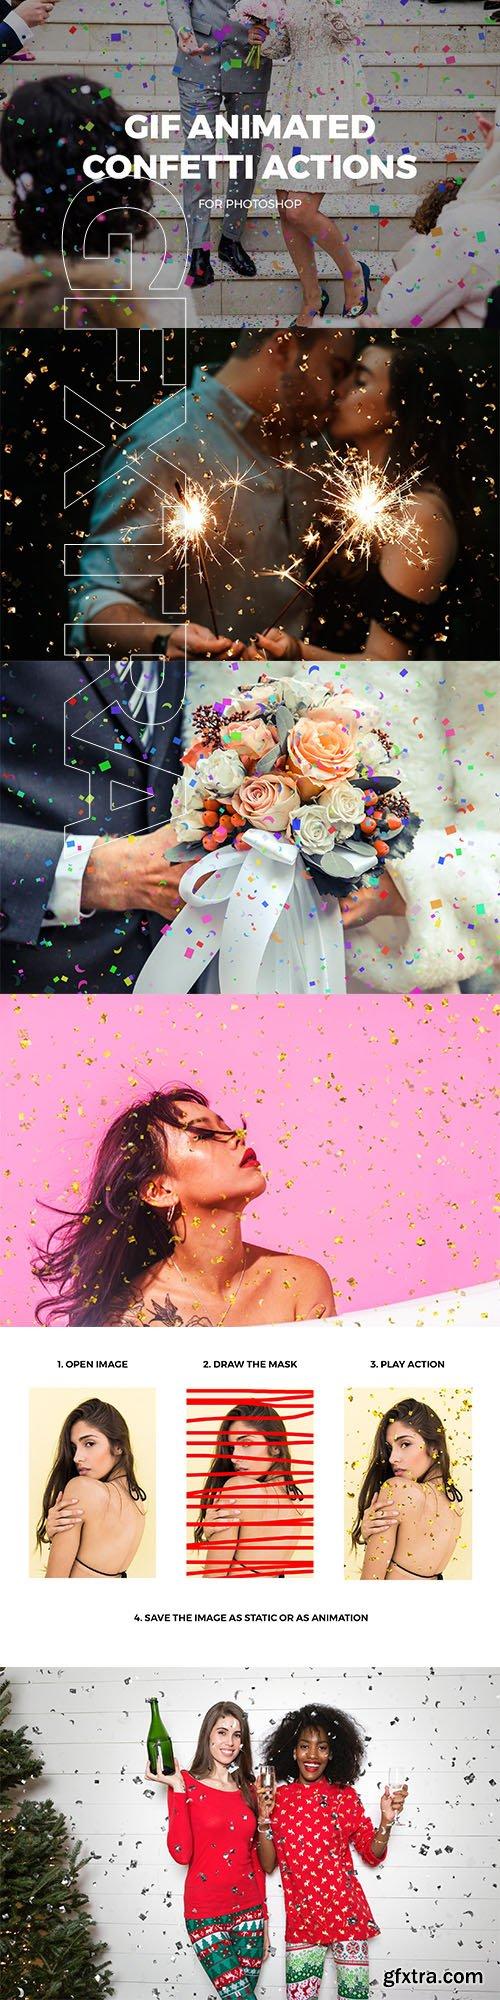 CreativeMarket - Gif Animated Confetti Actions 3325616